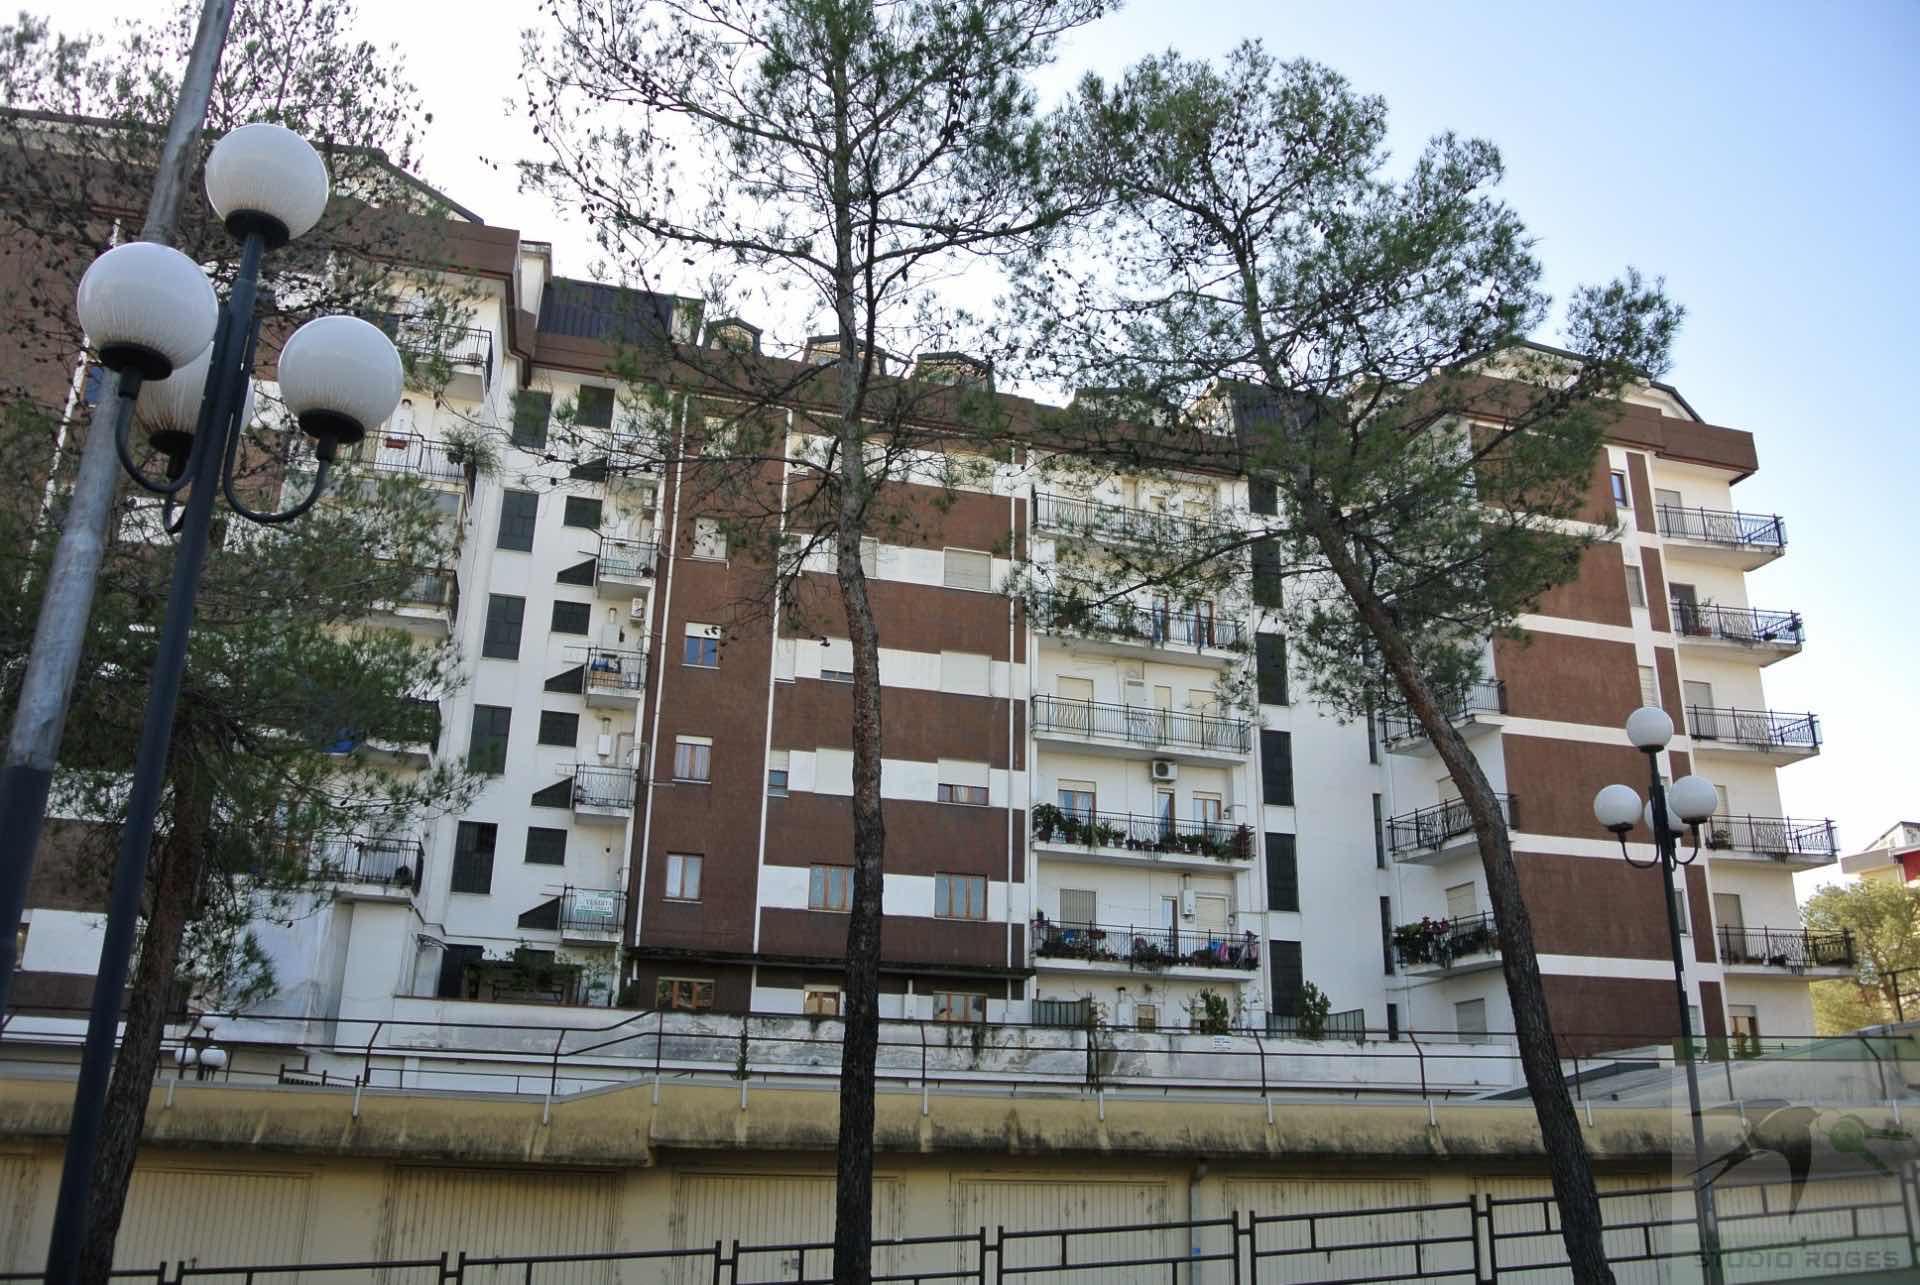 Appartamento in Vendita 175,10 mq - N. camere: 5 - - Rende - Roges-Commenda (CS)